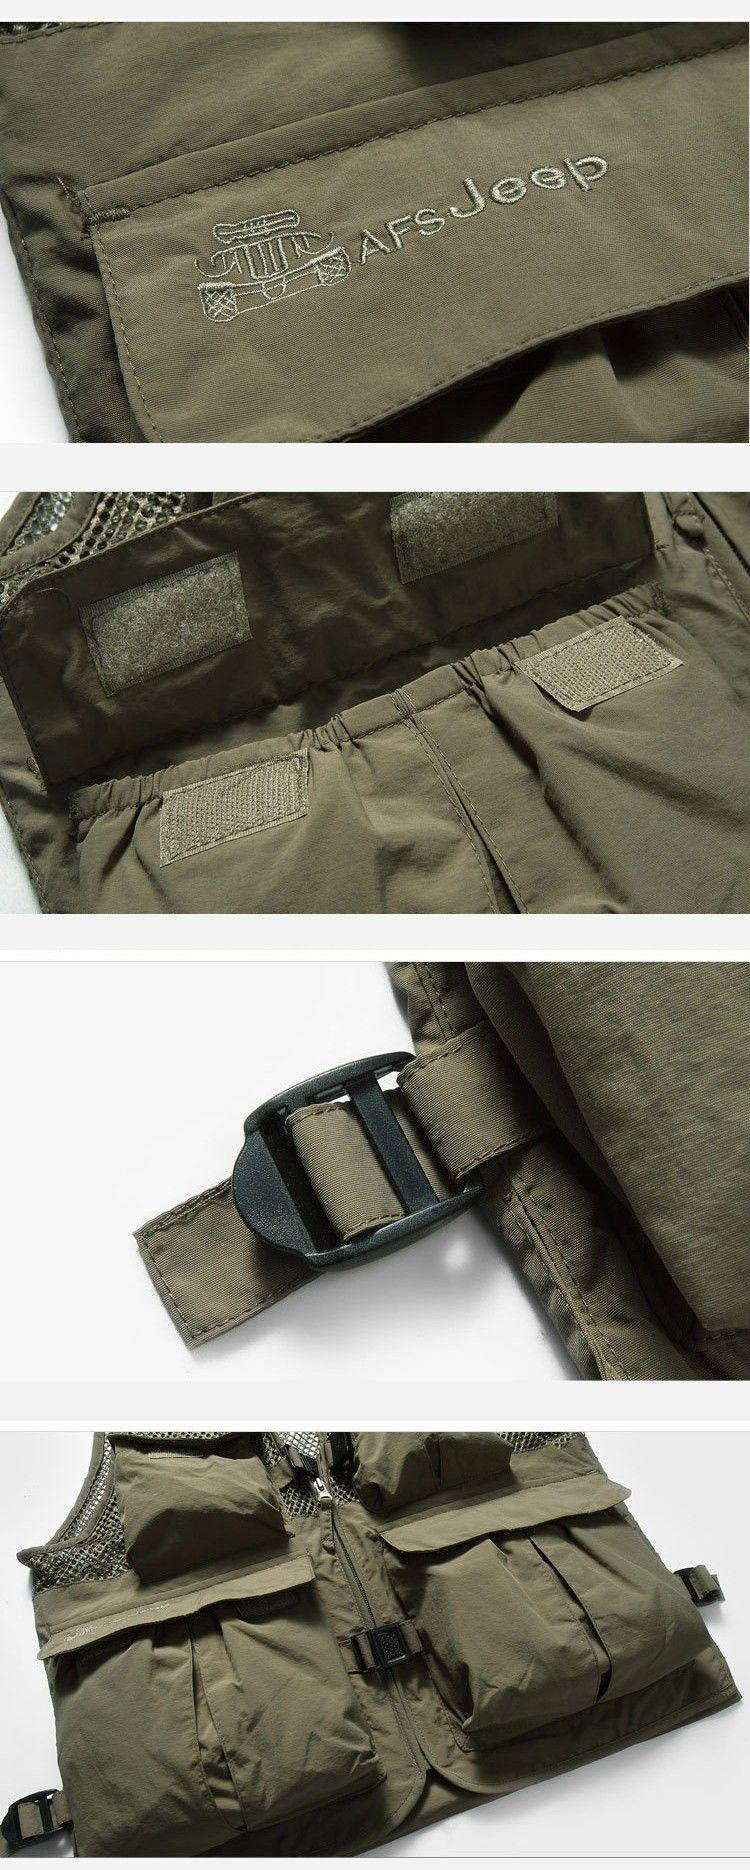 50% OFF High Quality Summer men's Vest Brand Multifunctional Quick Dry Mesh Vest Outdoor Casual Vest For Men 55hfx 188